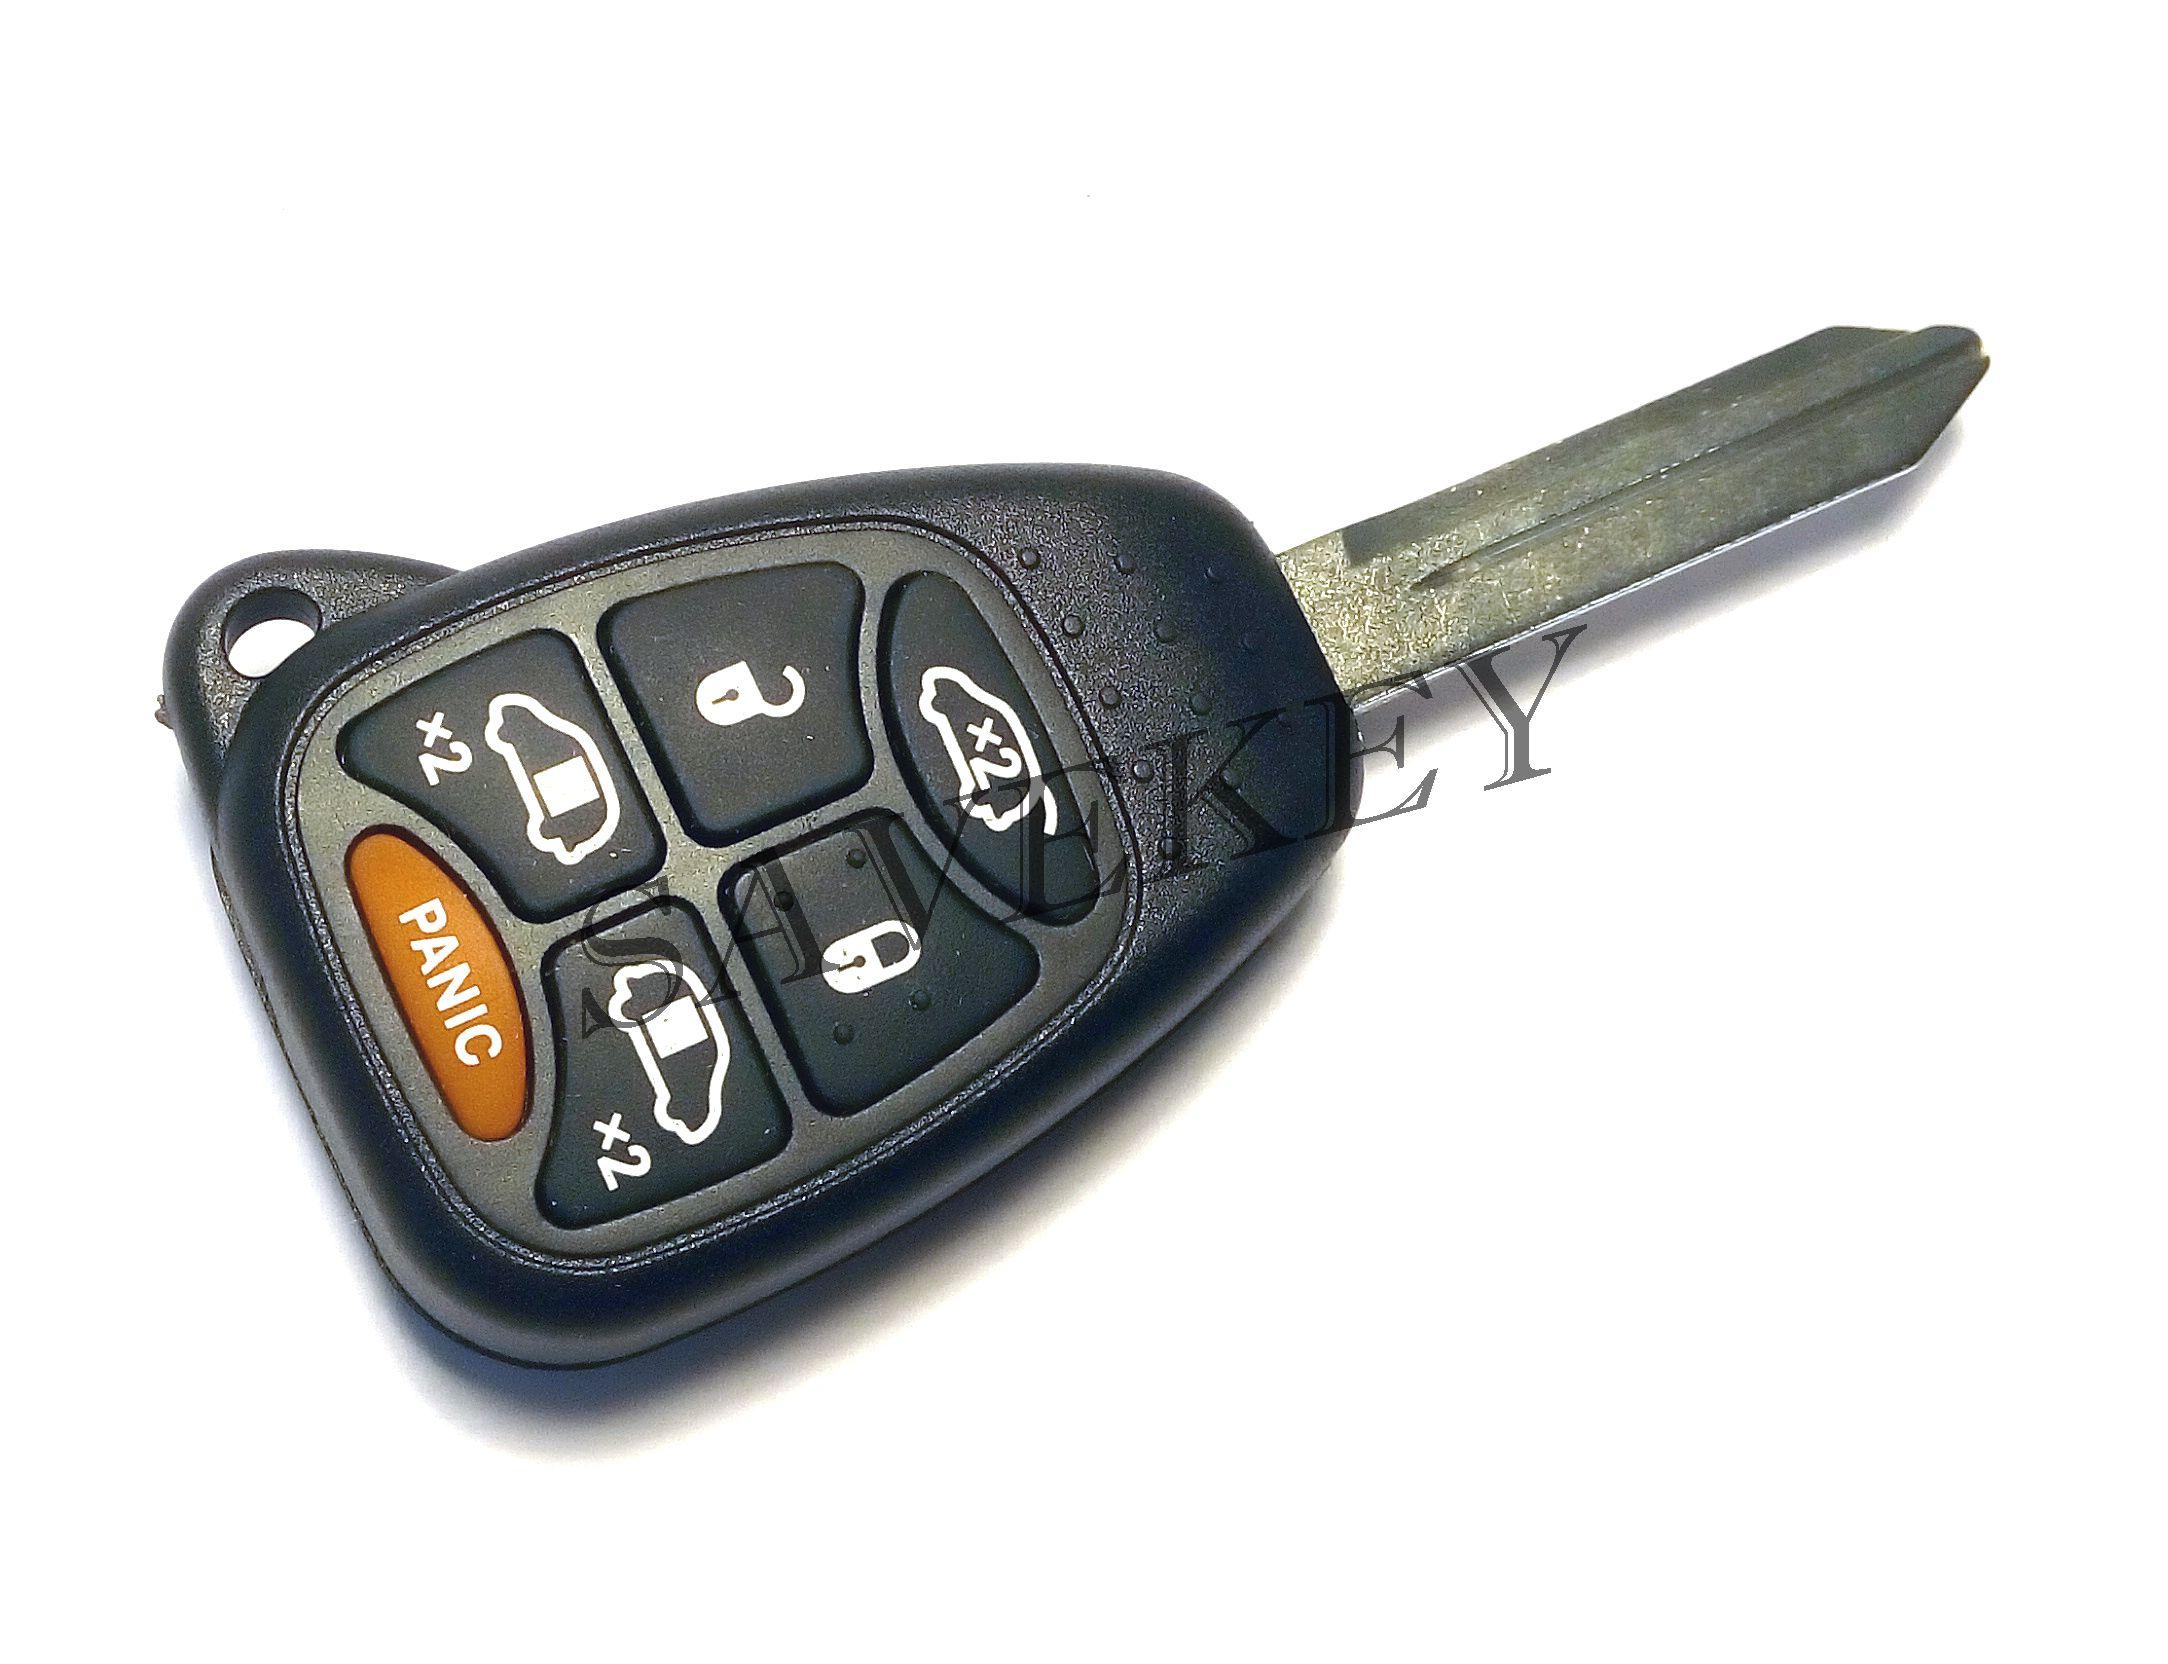 Дистанционный ключ Jeep для моделей PACIFICA, LIBERTY, COMPASS, CHEROKEE, LIBERTY, WRANGLER 6 кнопок 315 Mhz